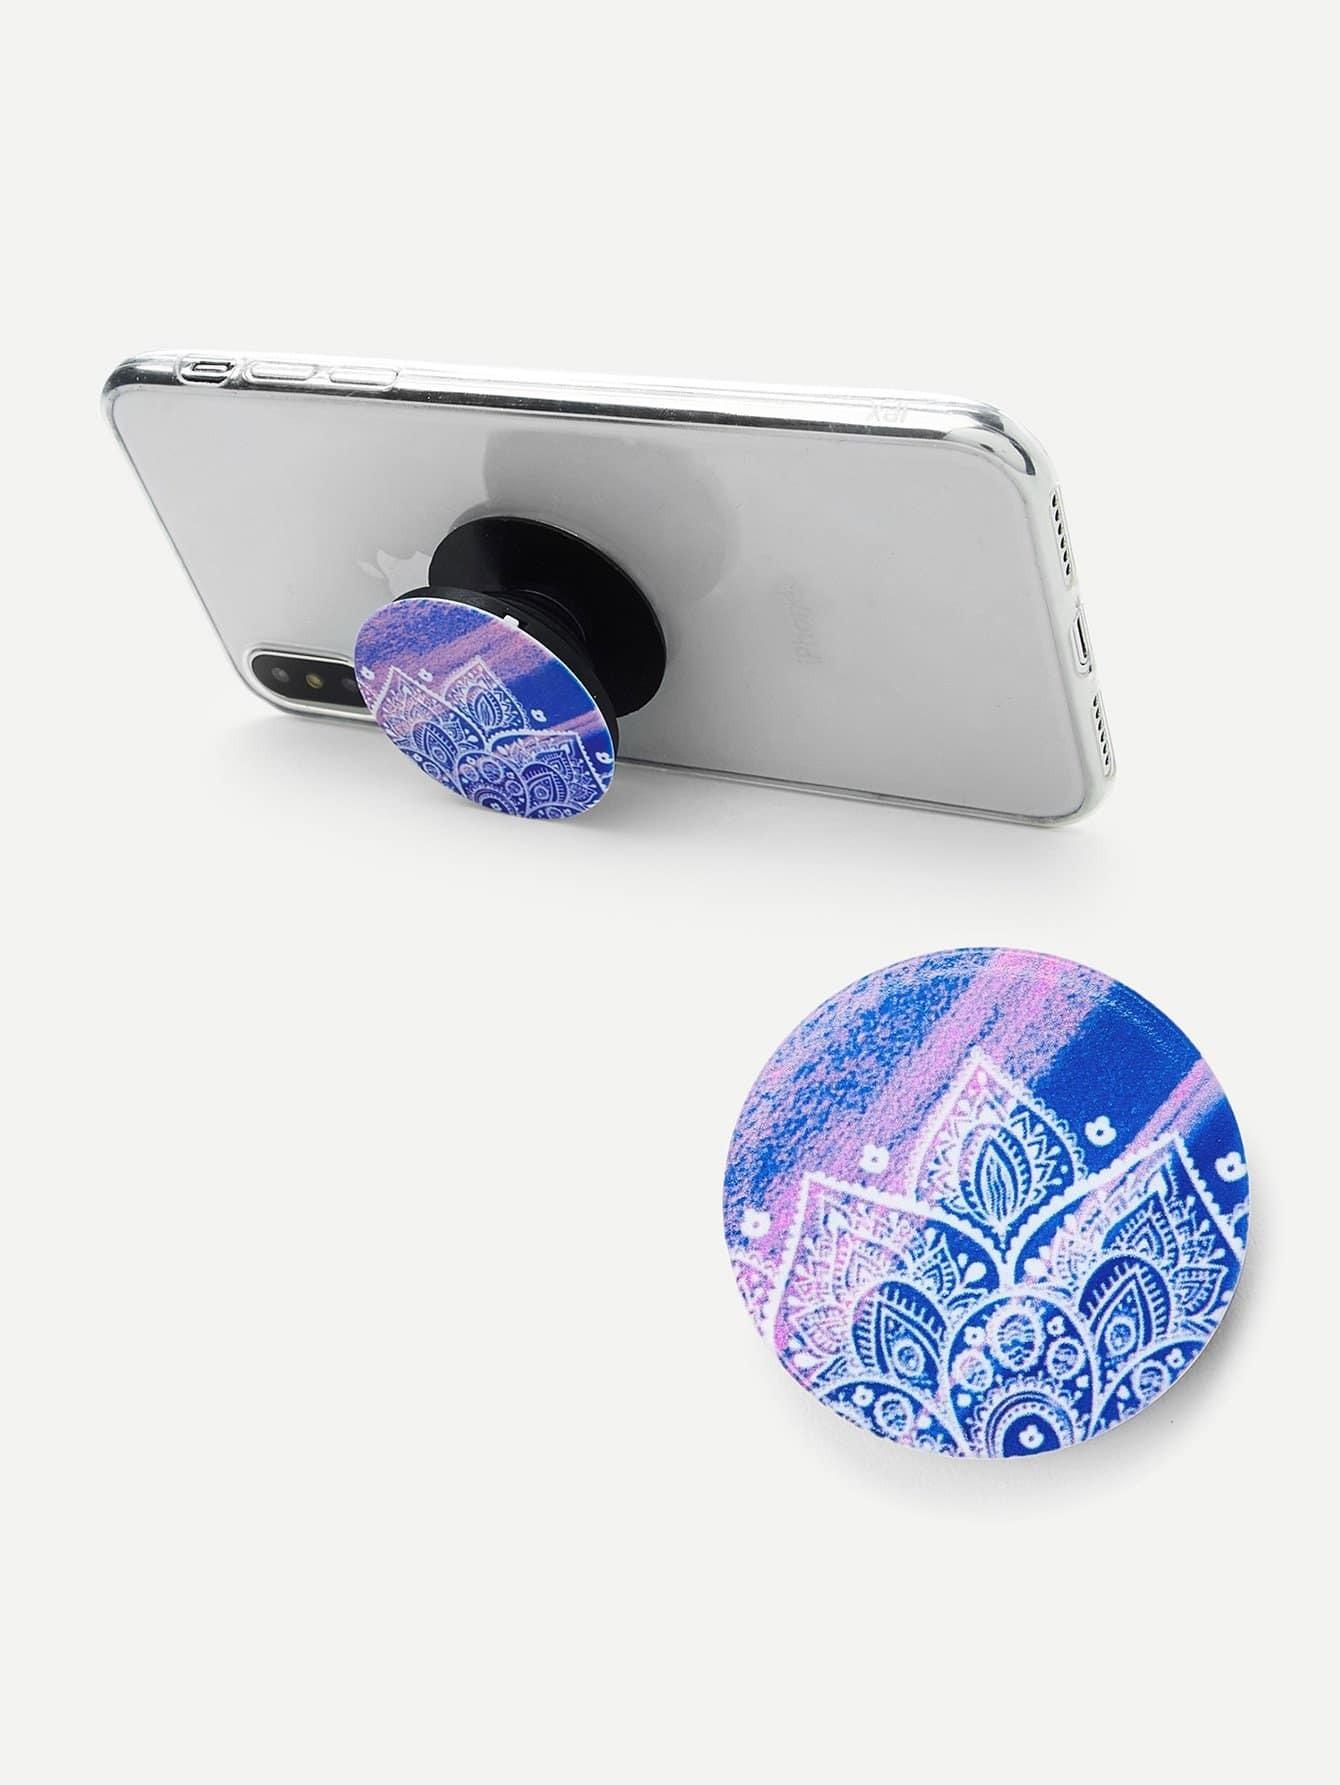 Mandala Flower Round Durable Phone Holder clip on earrings with mandala flower pattern round pendant